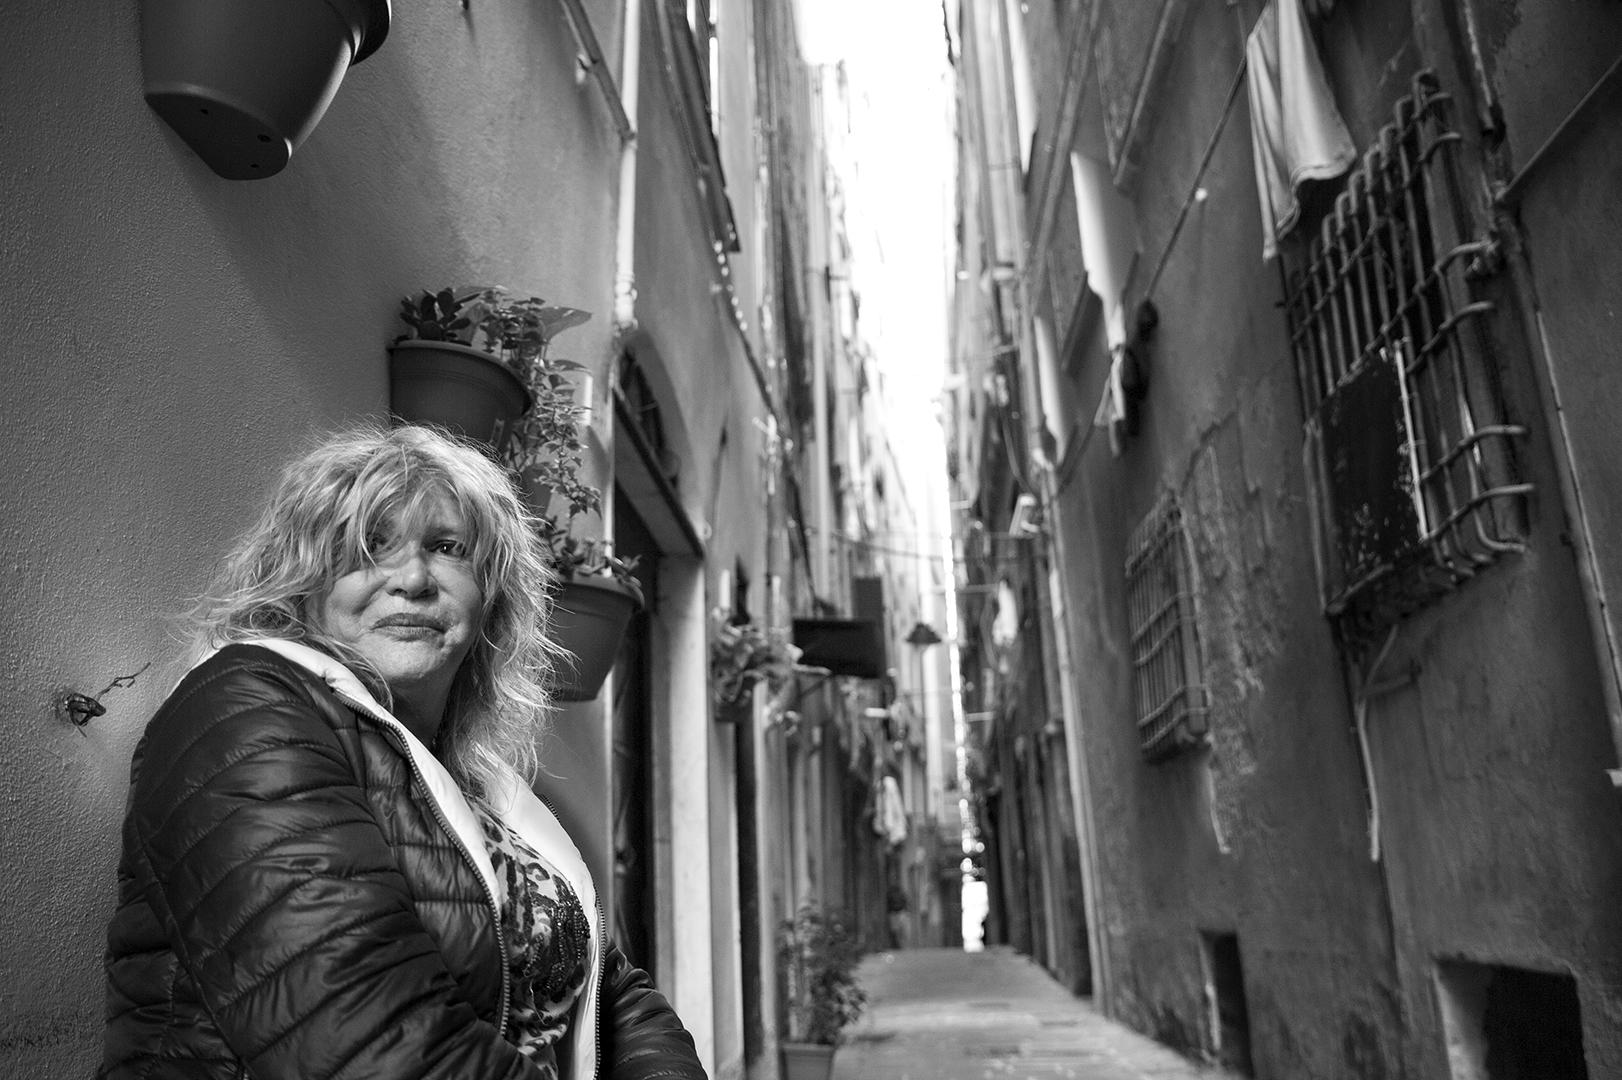 Genova, Rossella Bianchi, Princesa, 2017